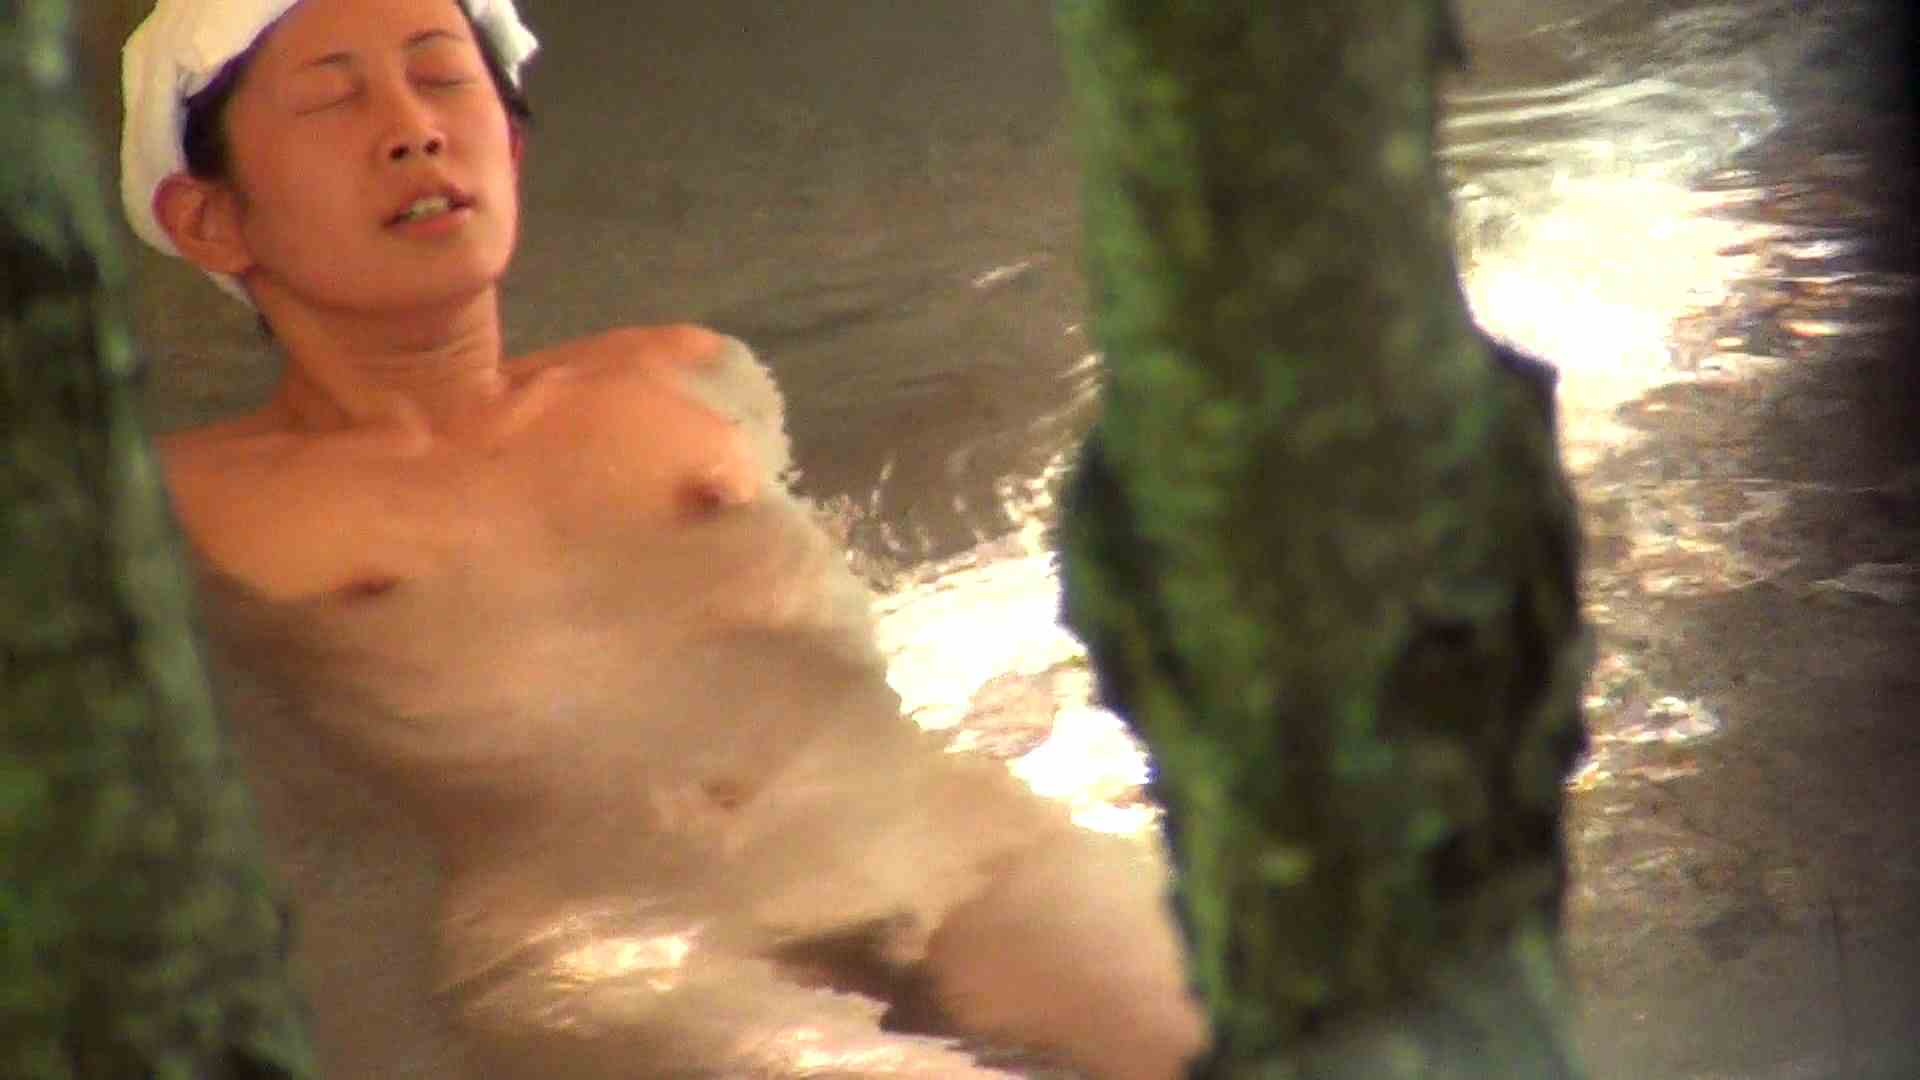 Aquaな露天風呂Vol.281 露天風呂 すけべAV動画紹介 57連発 53